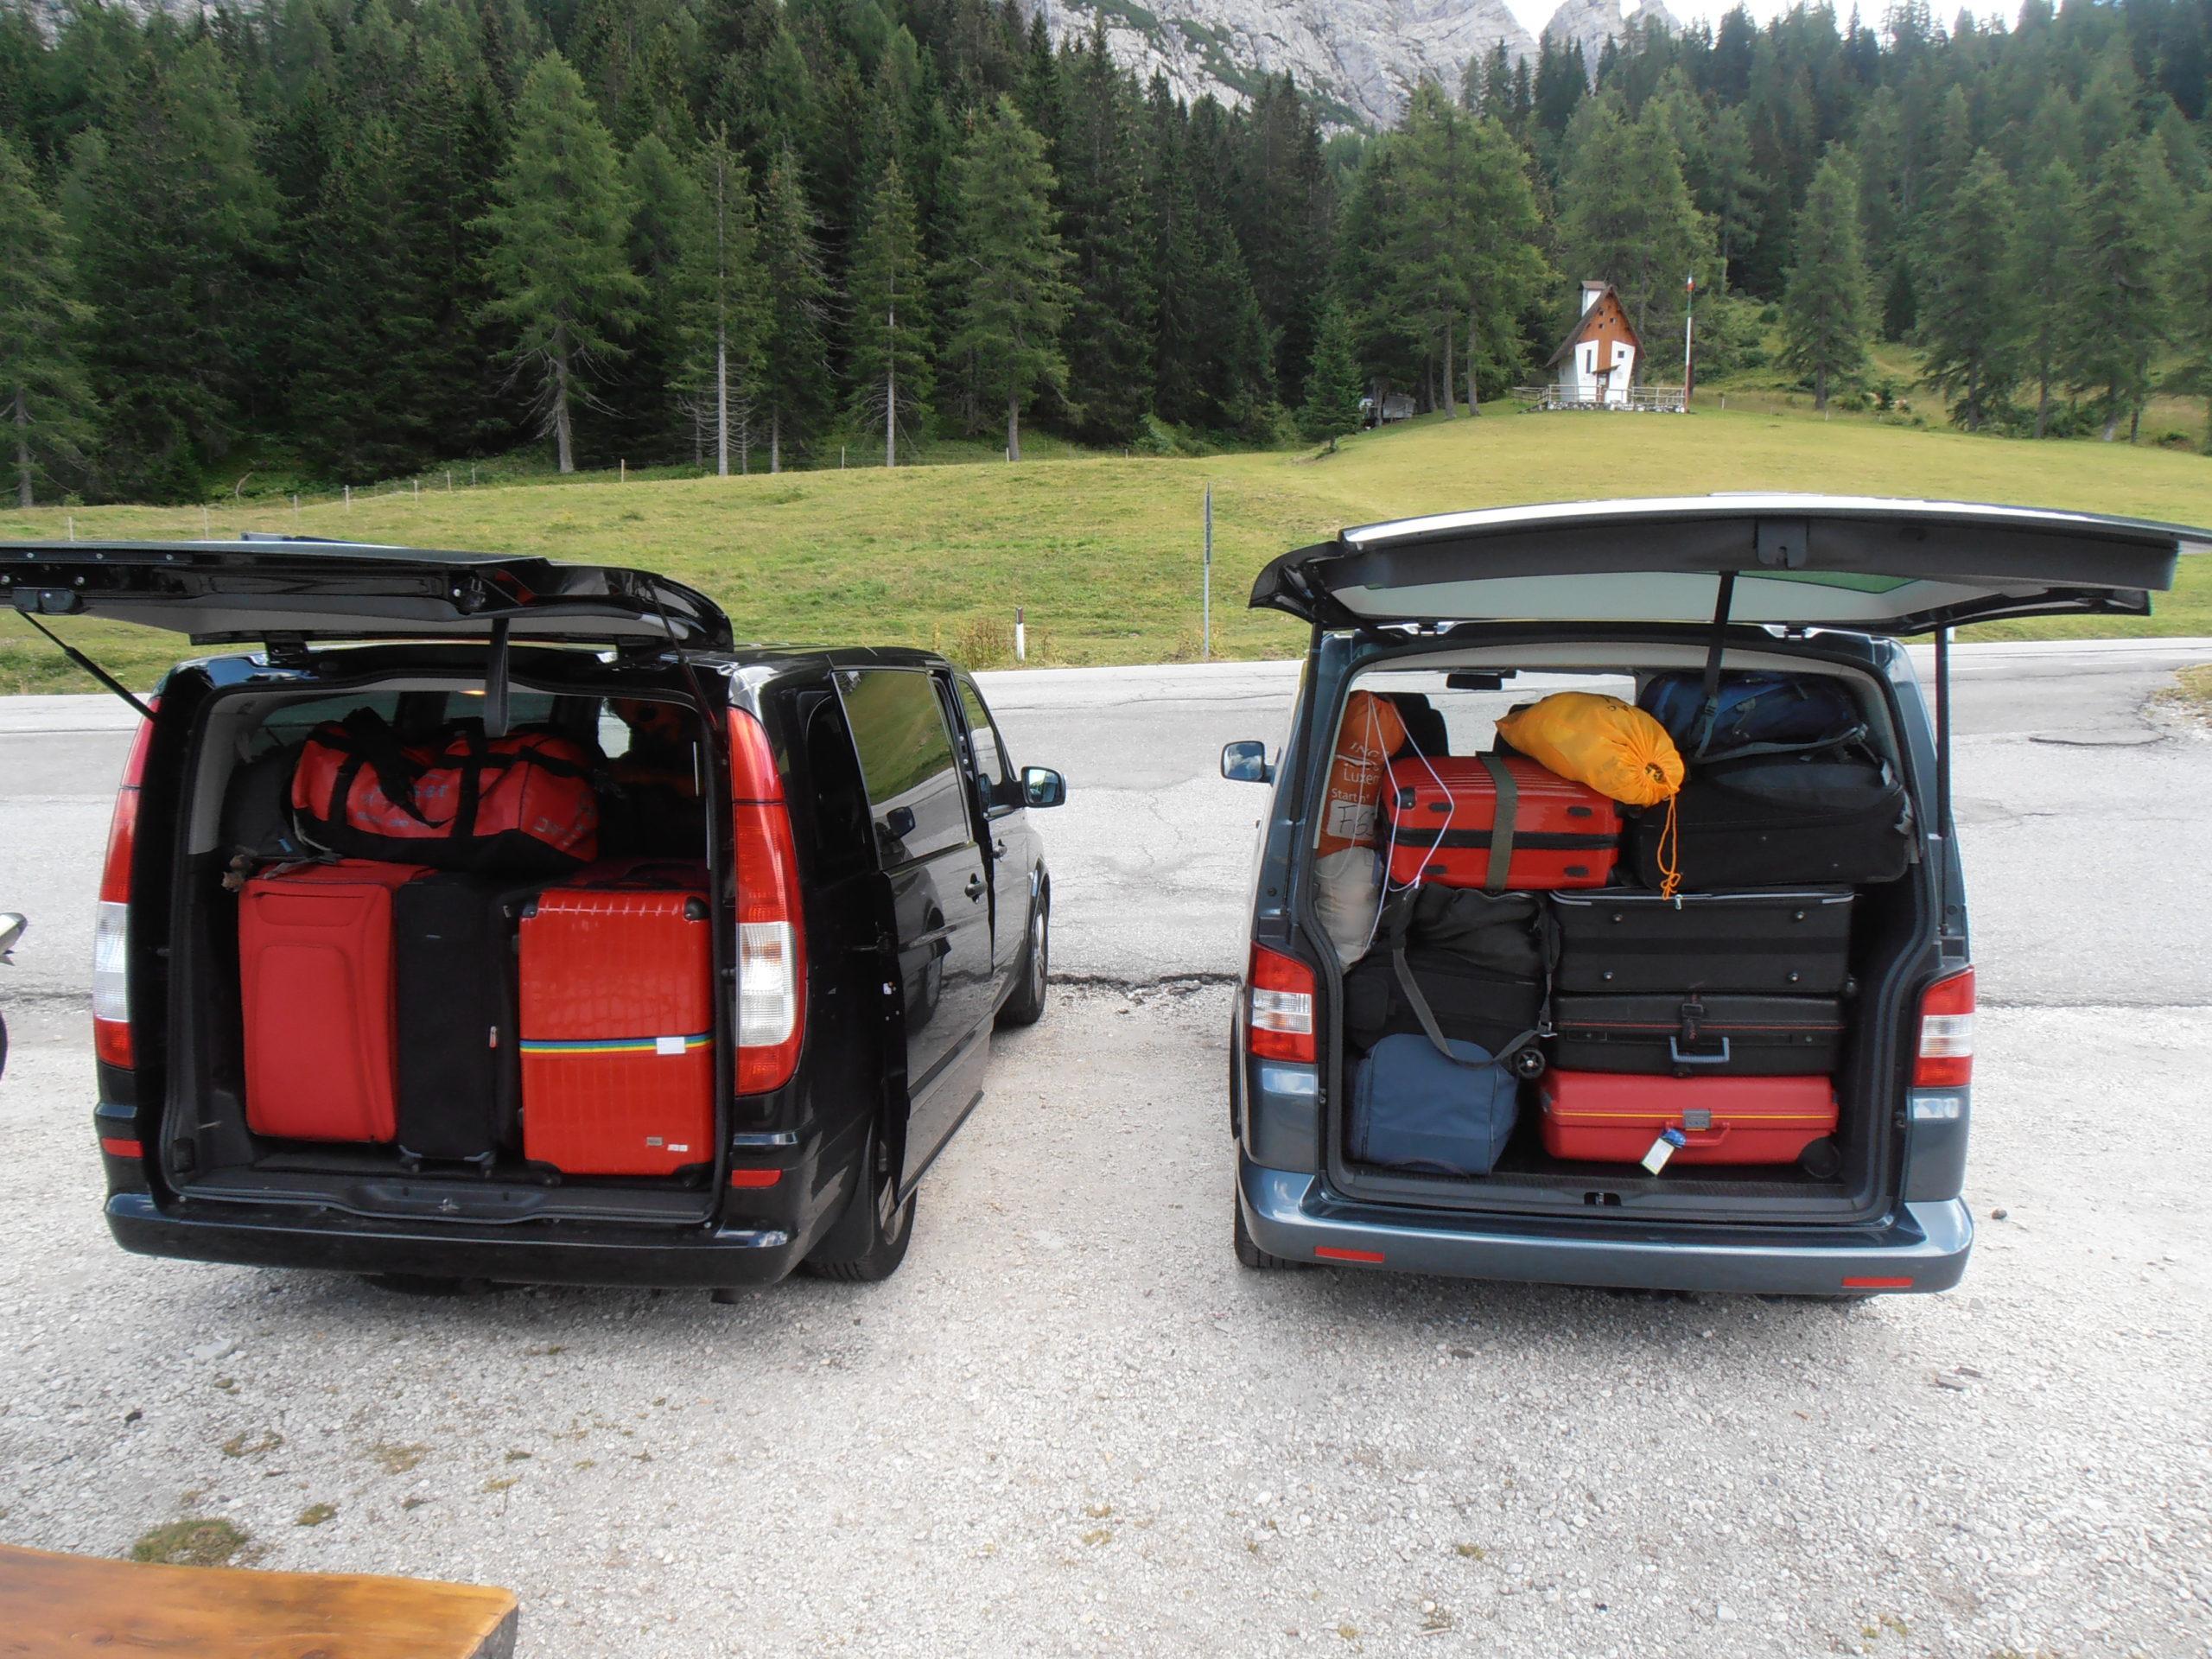 trasporto persone bagagli alta via 7 personengepäck transportieren AV7